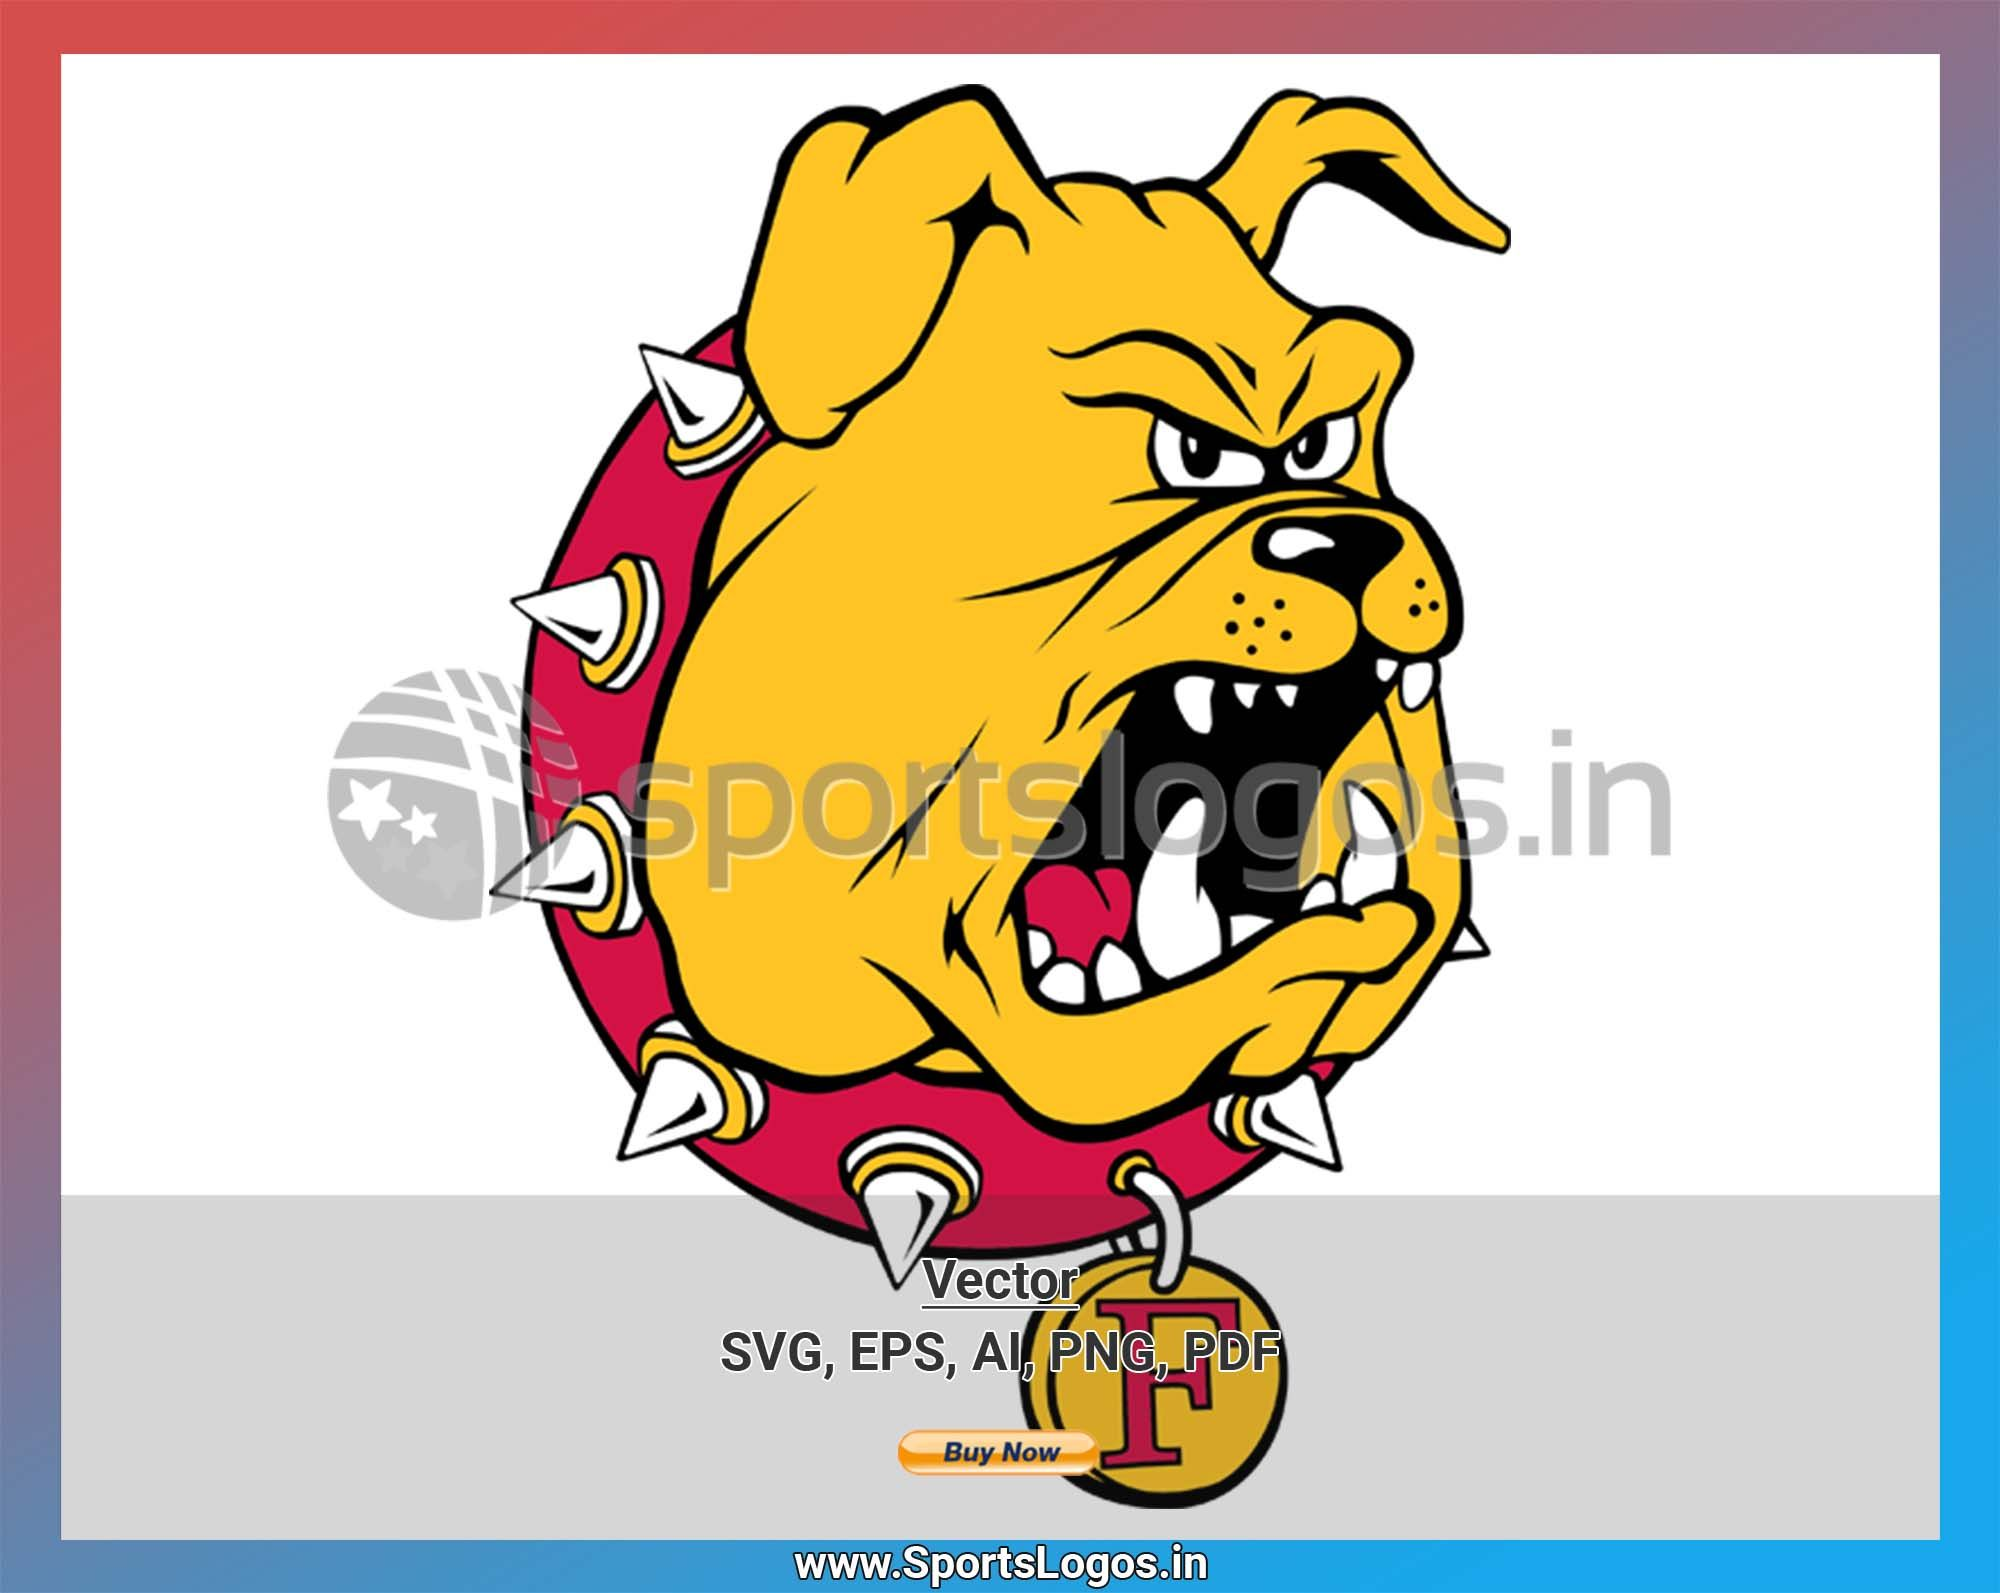 Ferris State Bulldogs College Sports Vector SVG Logo in